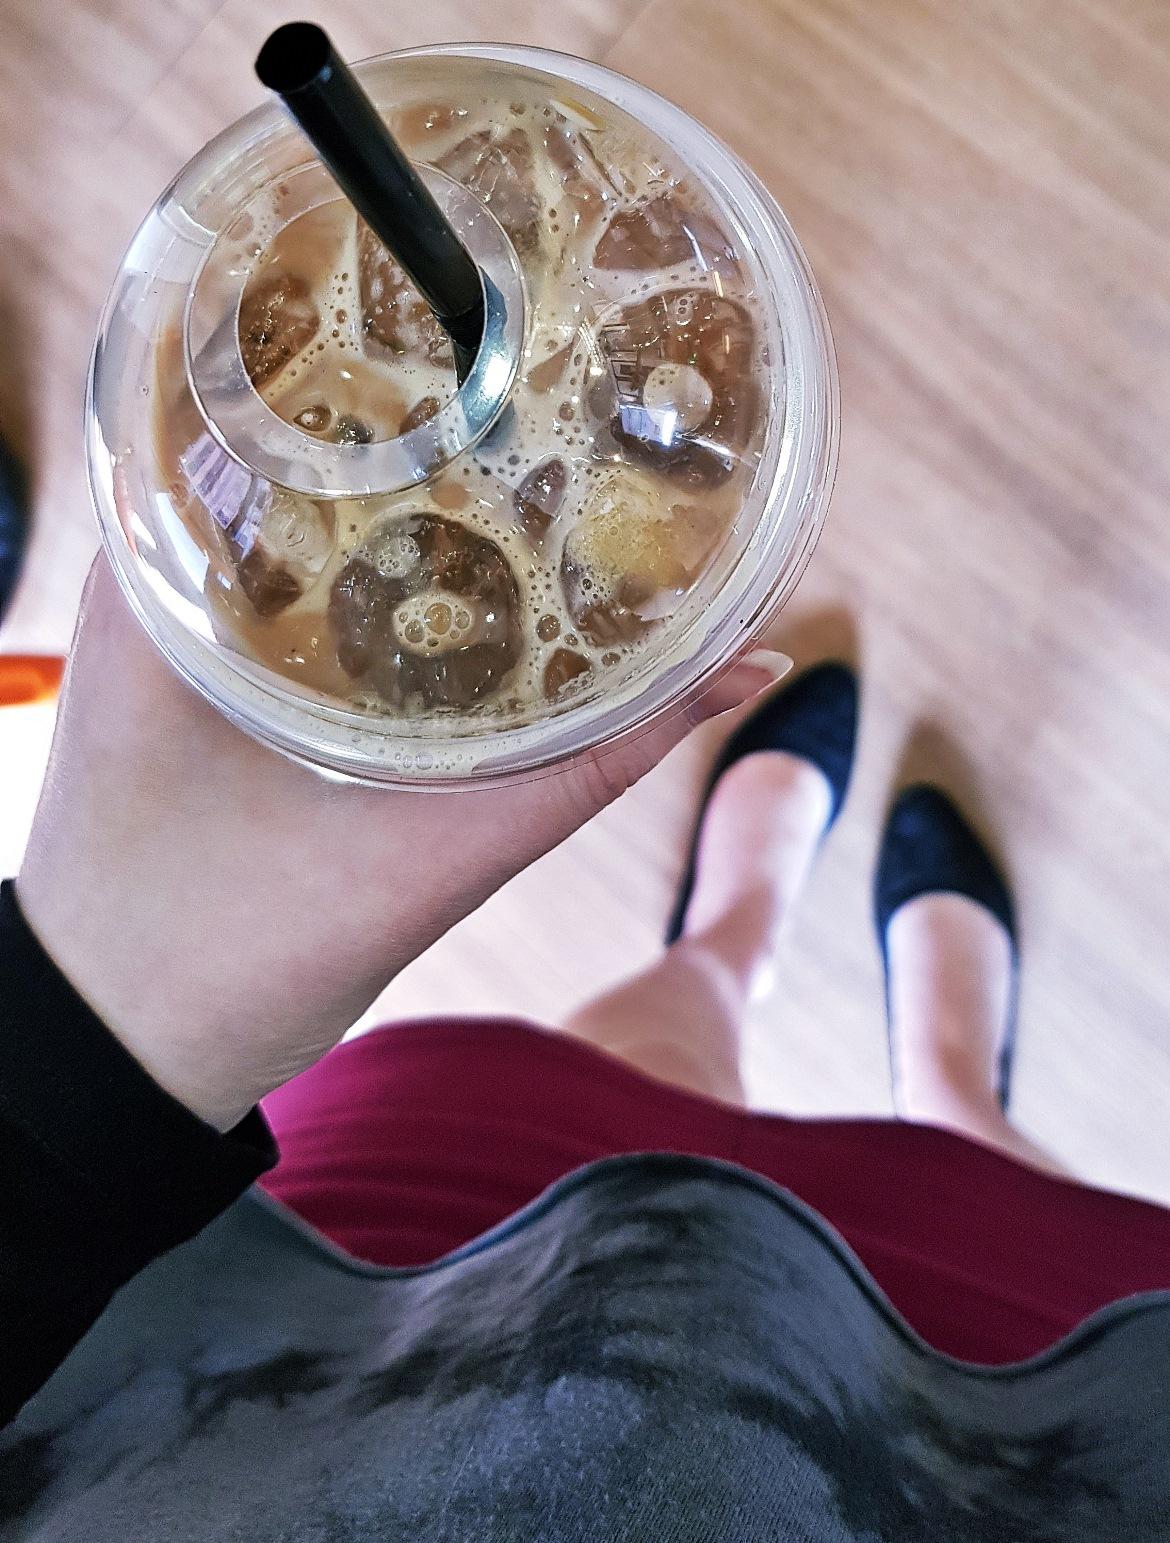 Iced latte - April 2018 Monthly Recap by BeckyBecky Blogs